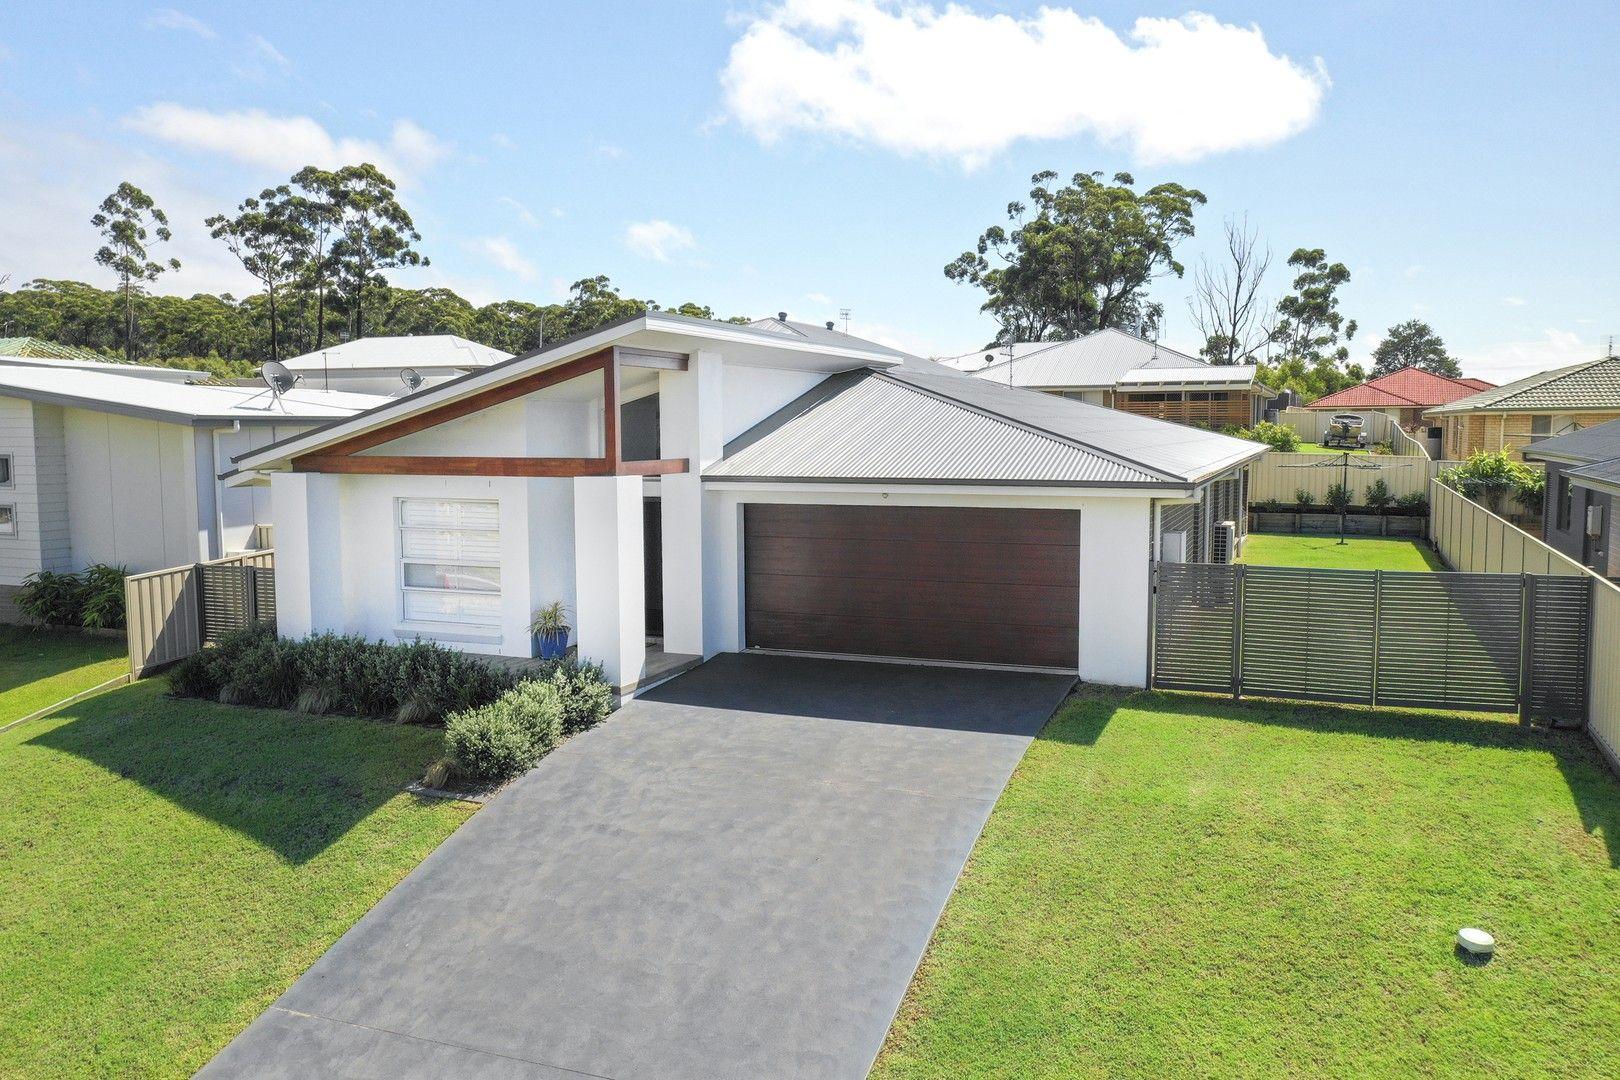 13 Frangipani Avenue, Ulladulla NSW 2539, Image 0